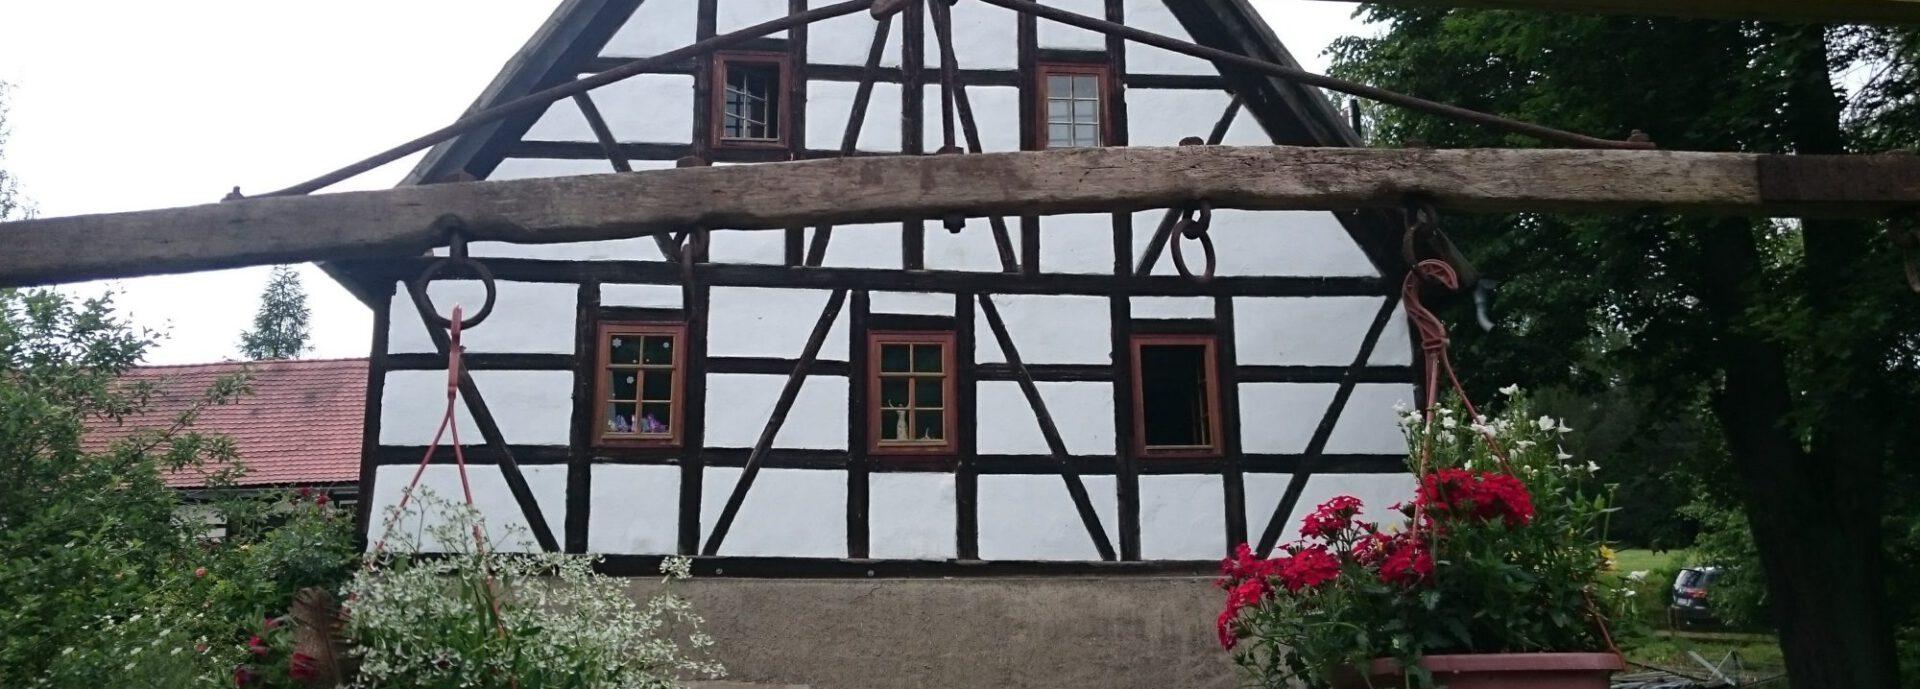 Appenhof / Wetzelmühle